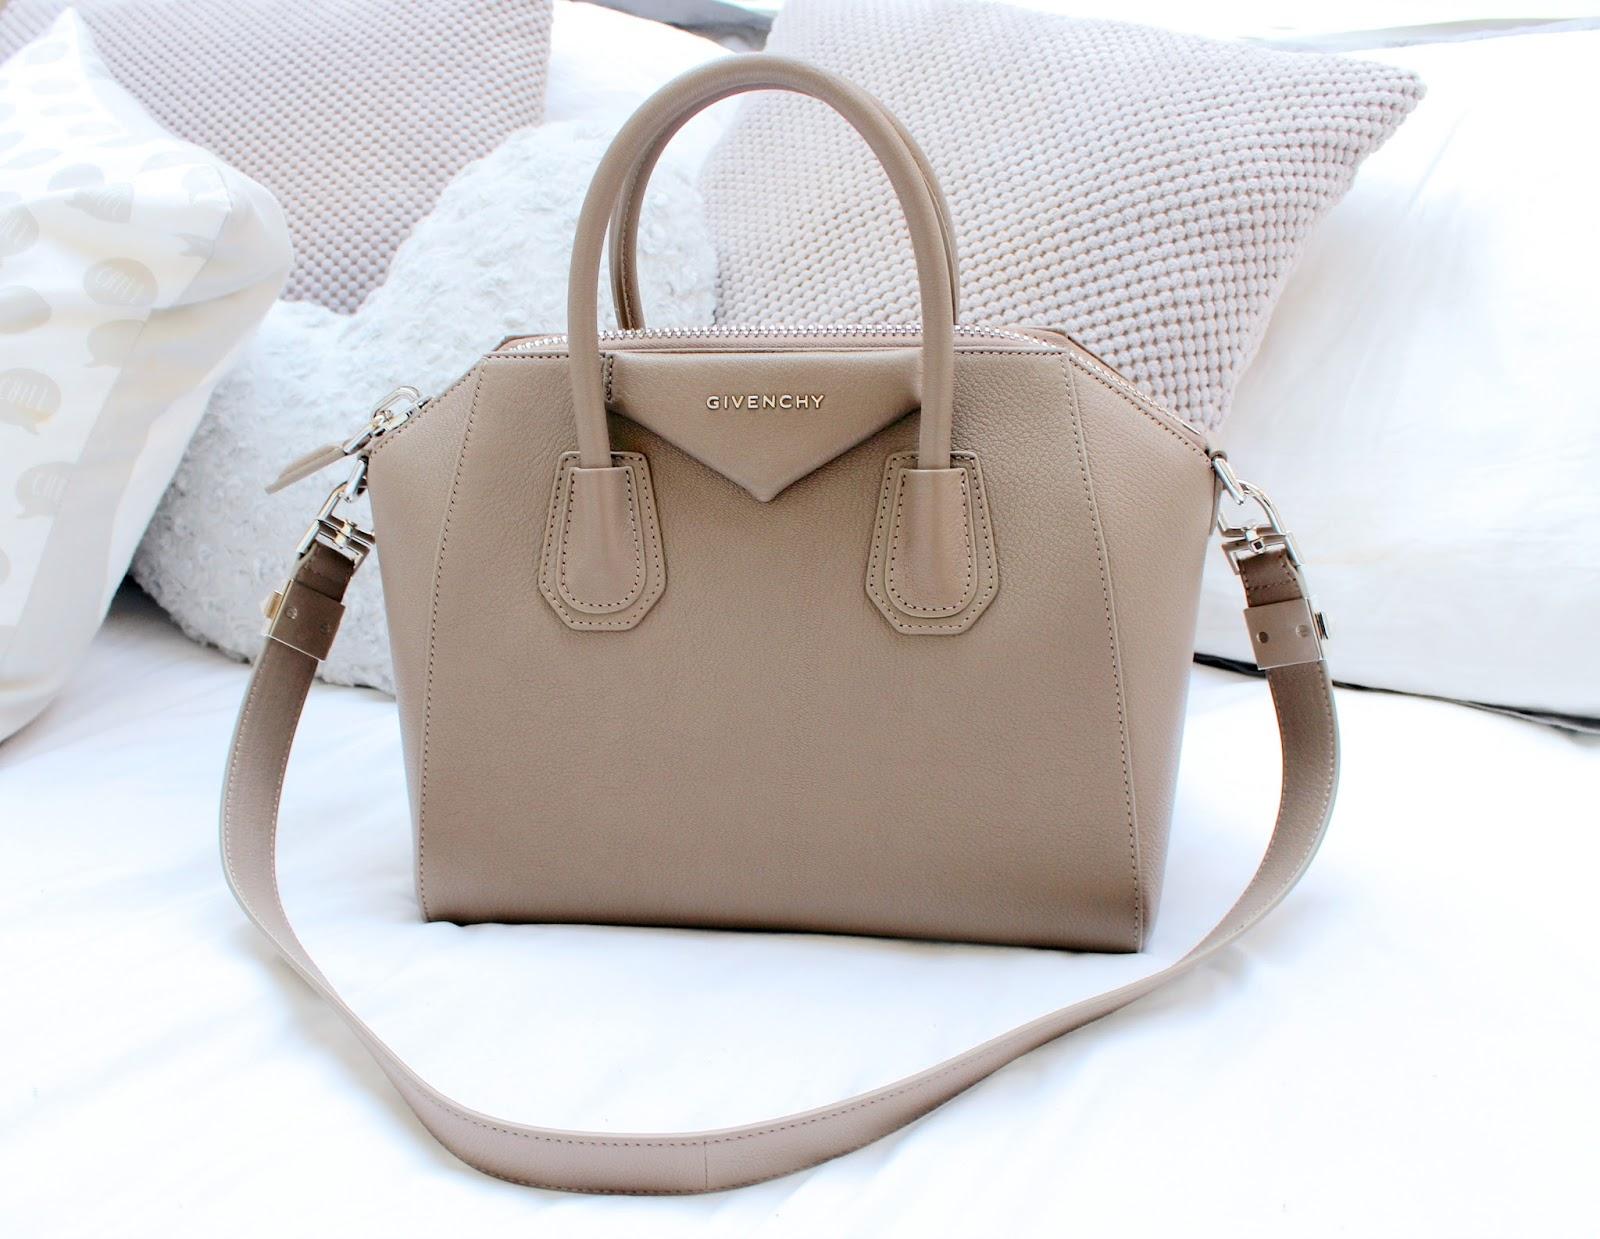 e5a8efa803 New Bag